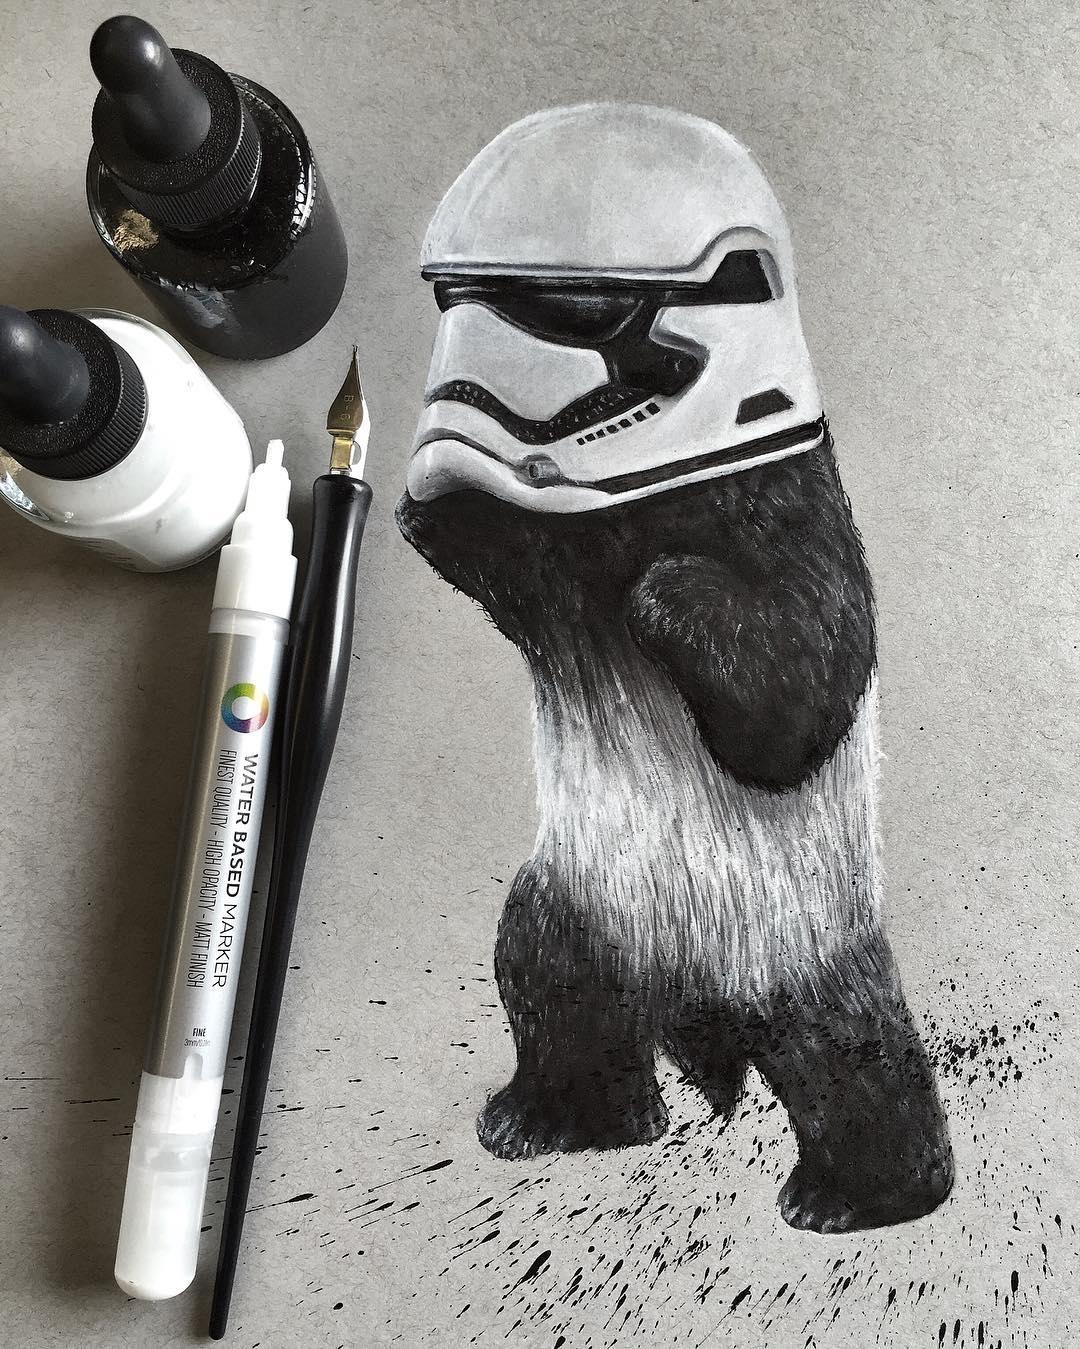 12-Panda-Dark-Side-Jonathan-Martinez-Art-of-the-Endangered-Paintings-and-Drawings-www-designstack-co